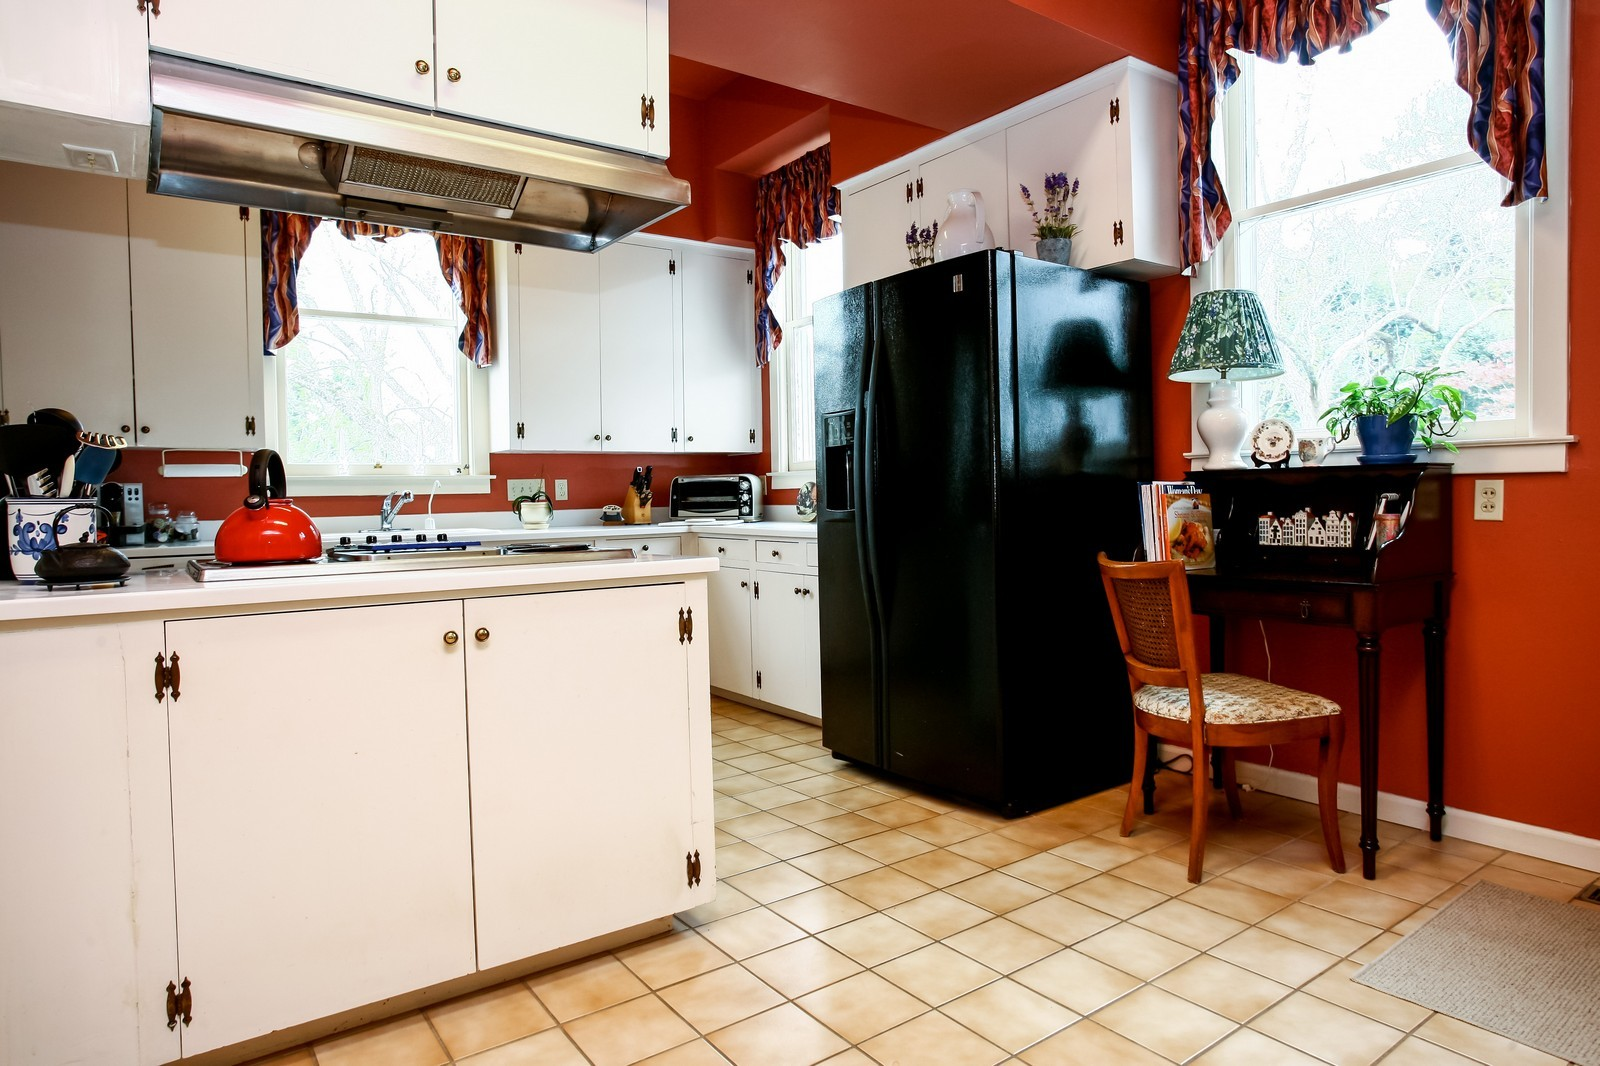 Real Estate Photography - 414 N 14th St, Lanett, AL, 36863 - Kitchen